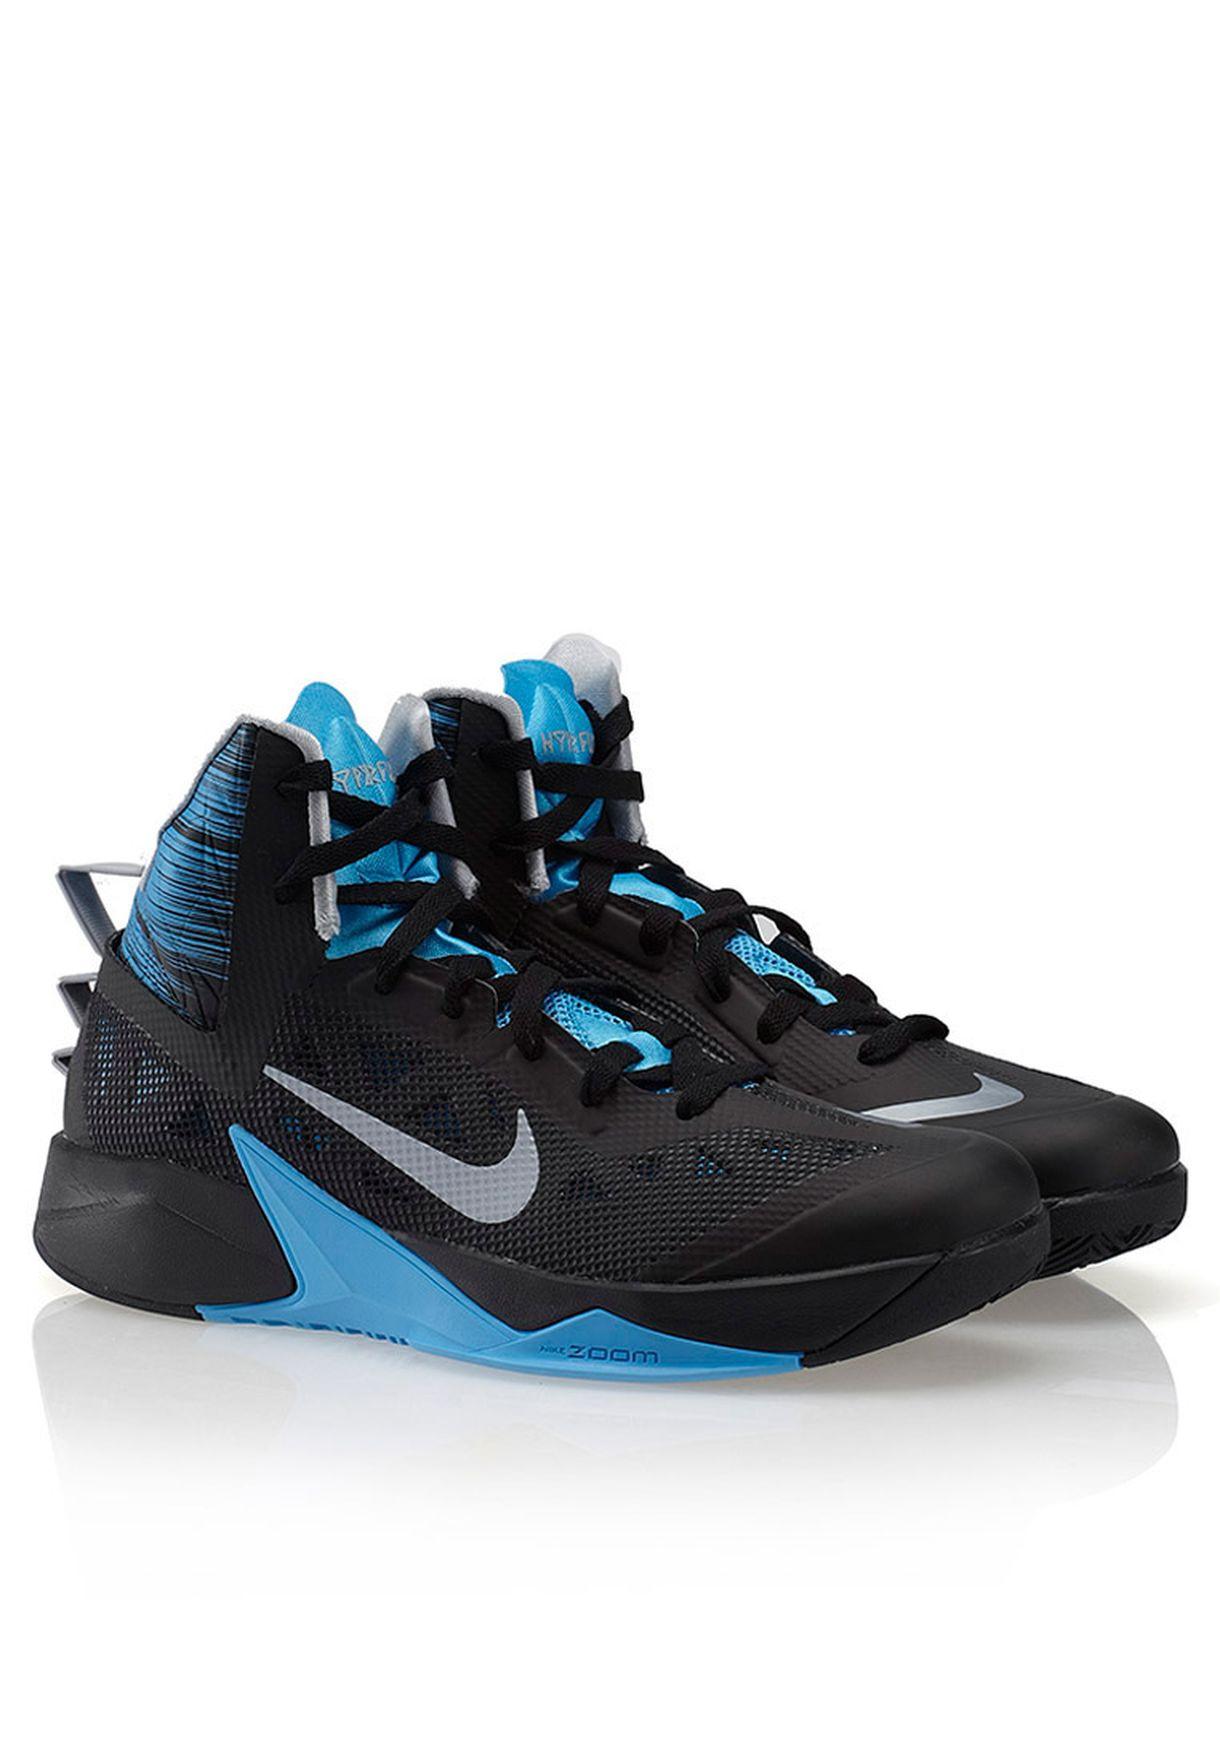 b14d121f4dbc Shop Nike black Zoom Hyperfuse 2013 615896-007 for Men in UAE ...